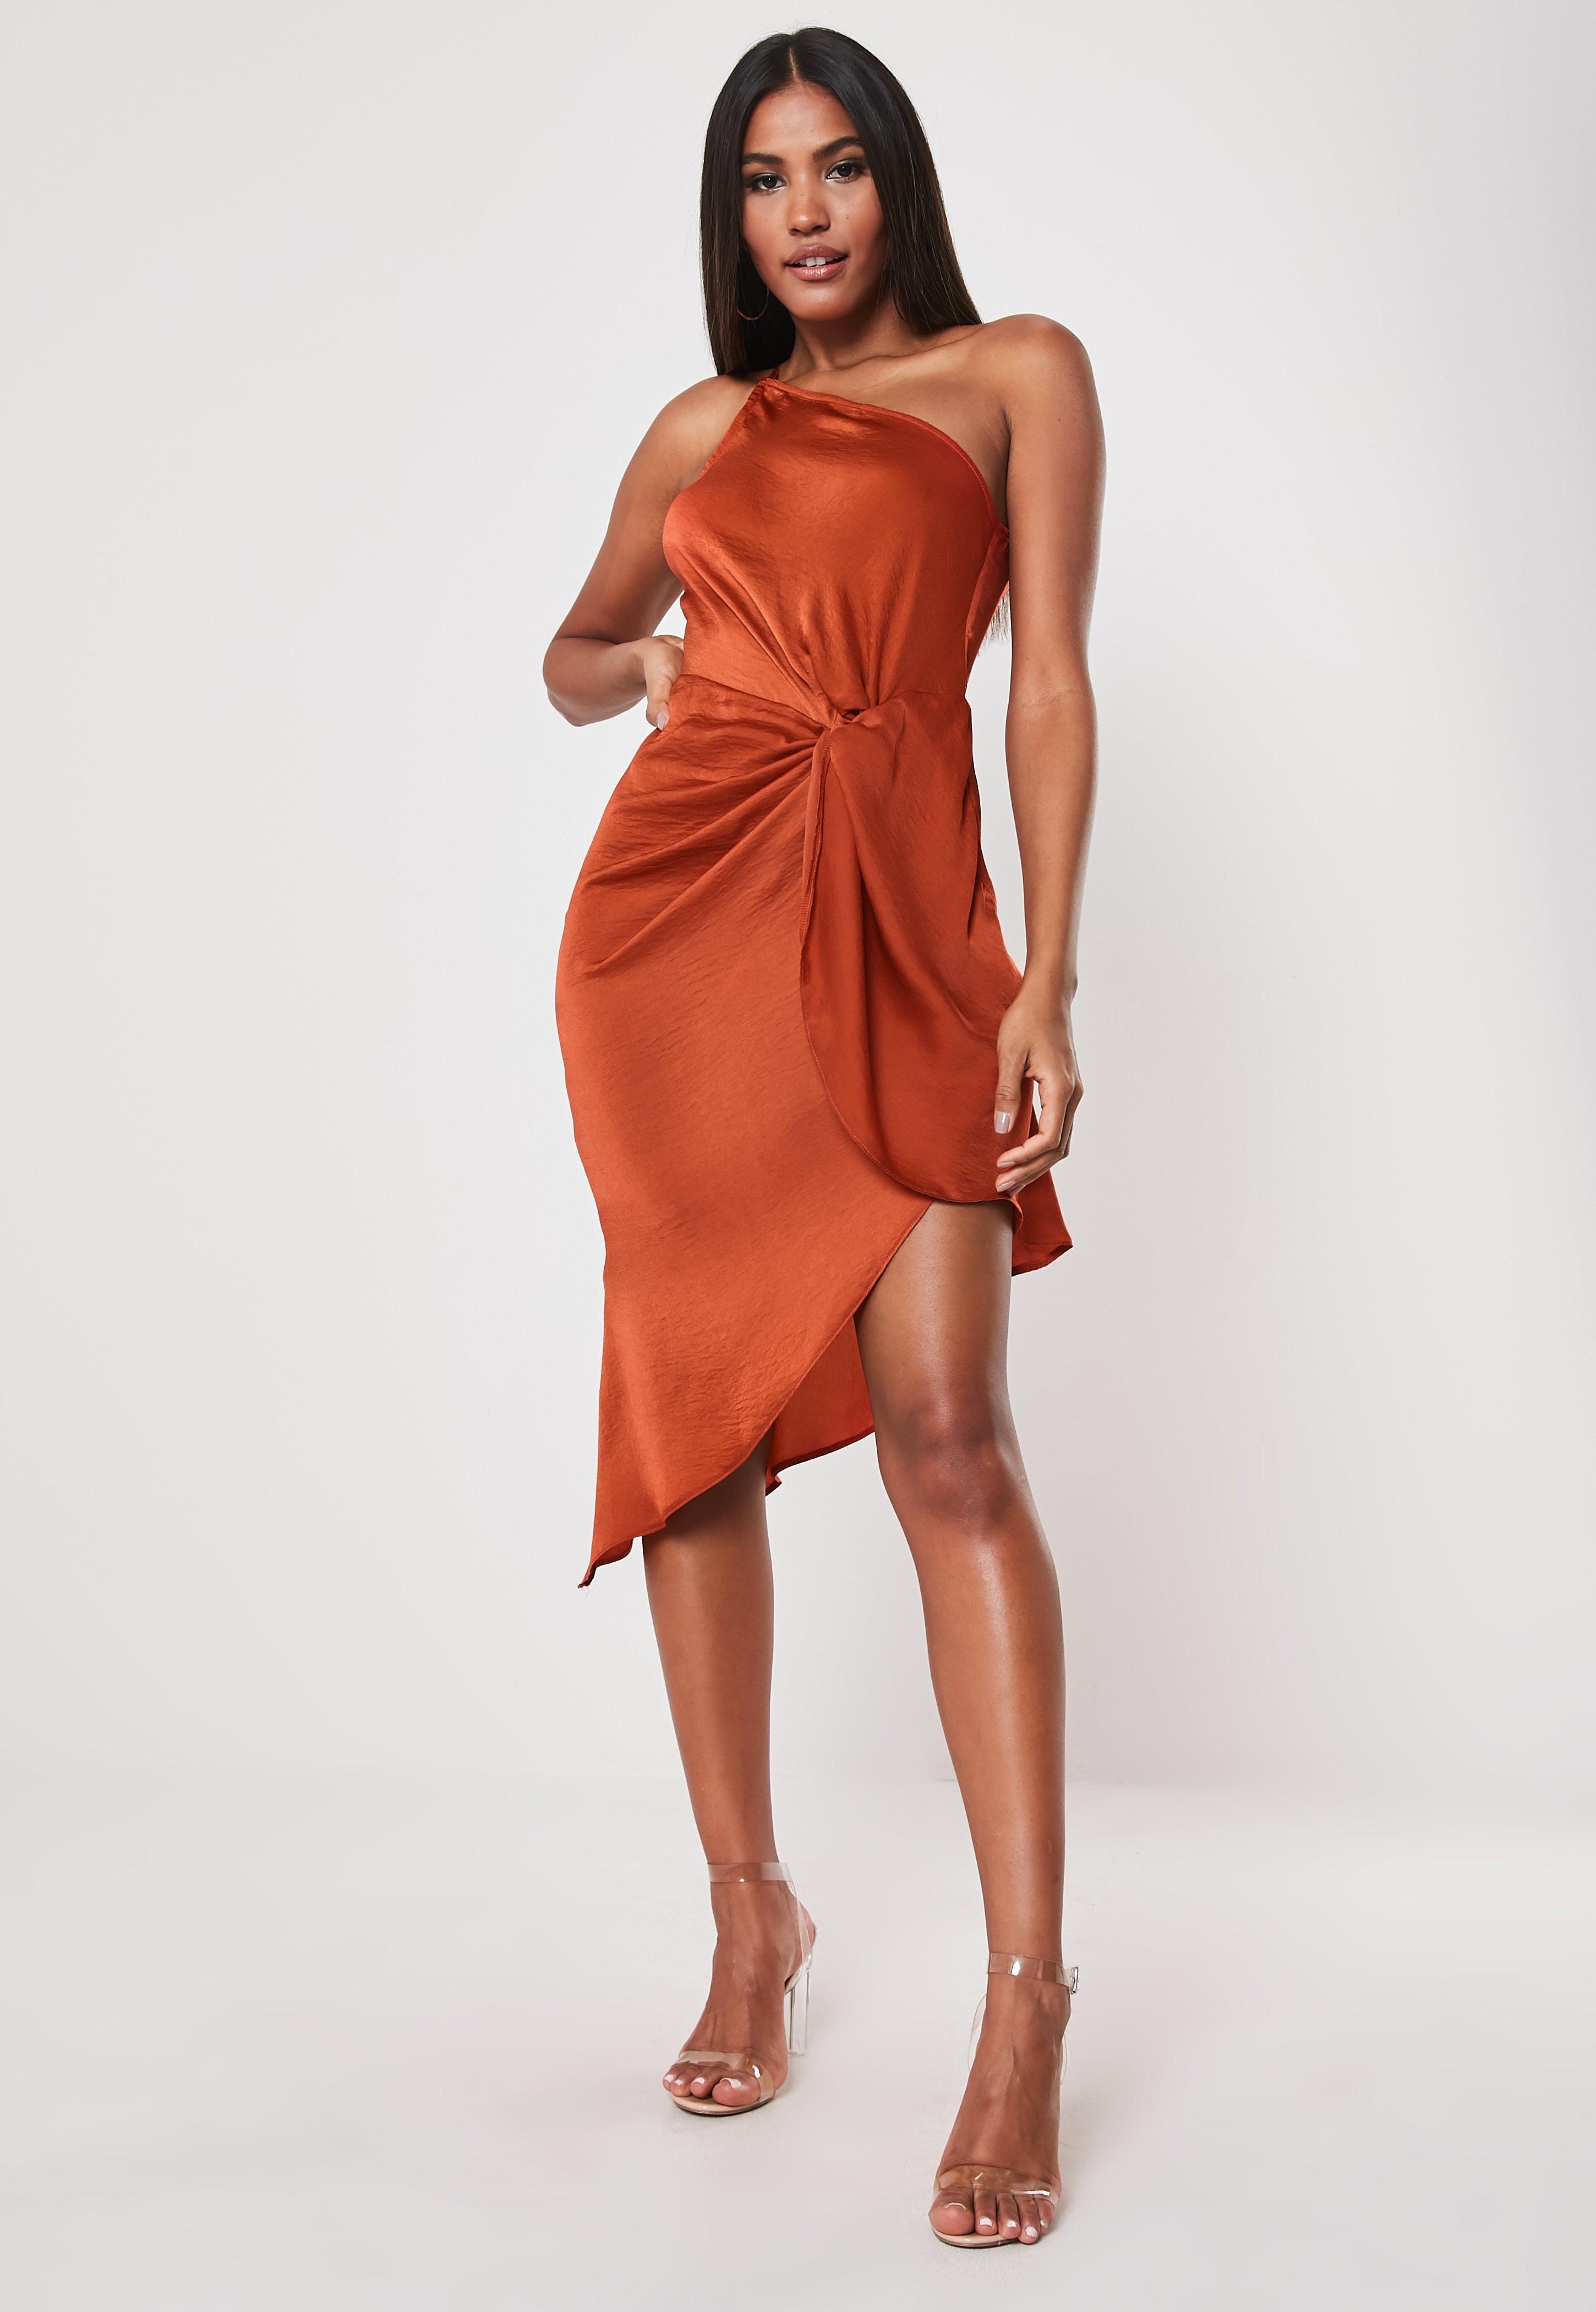 76228b534a7 Christmas Party Dress   Xmas Eve Dresses - Missguided